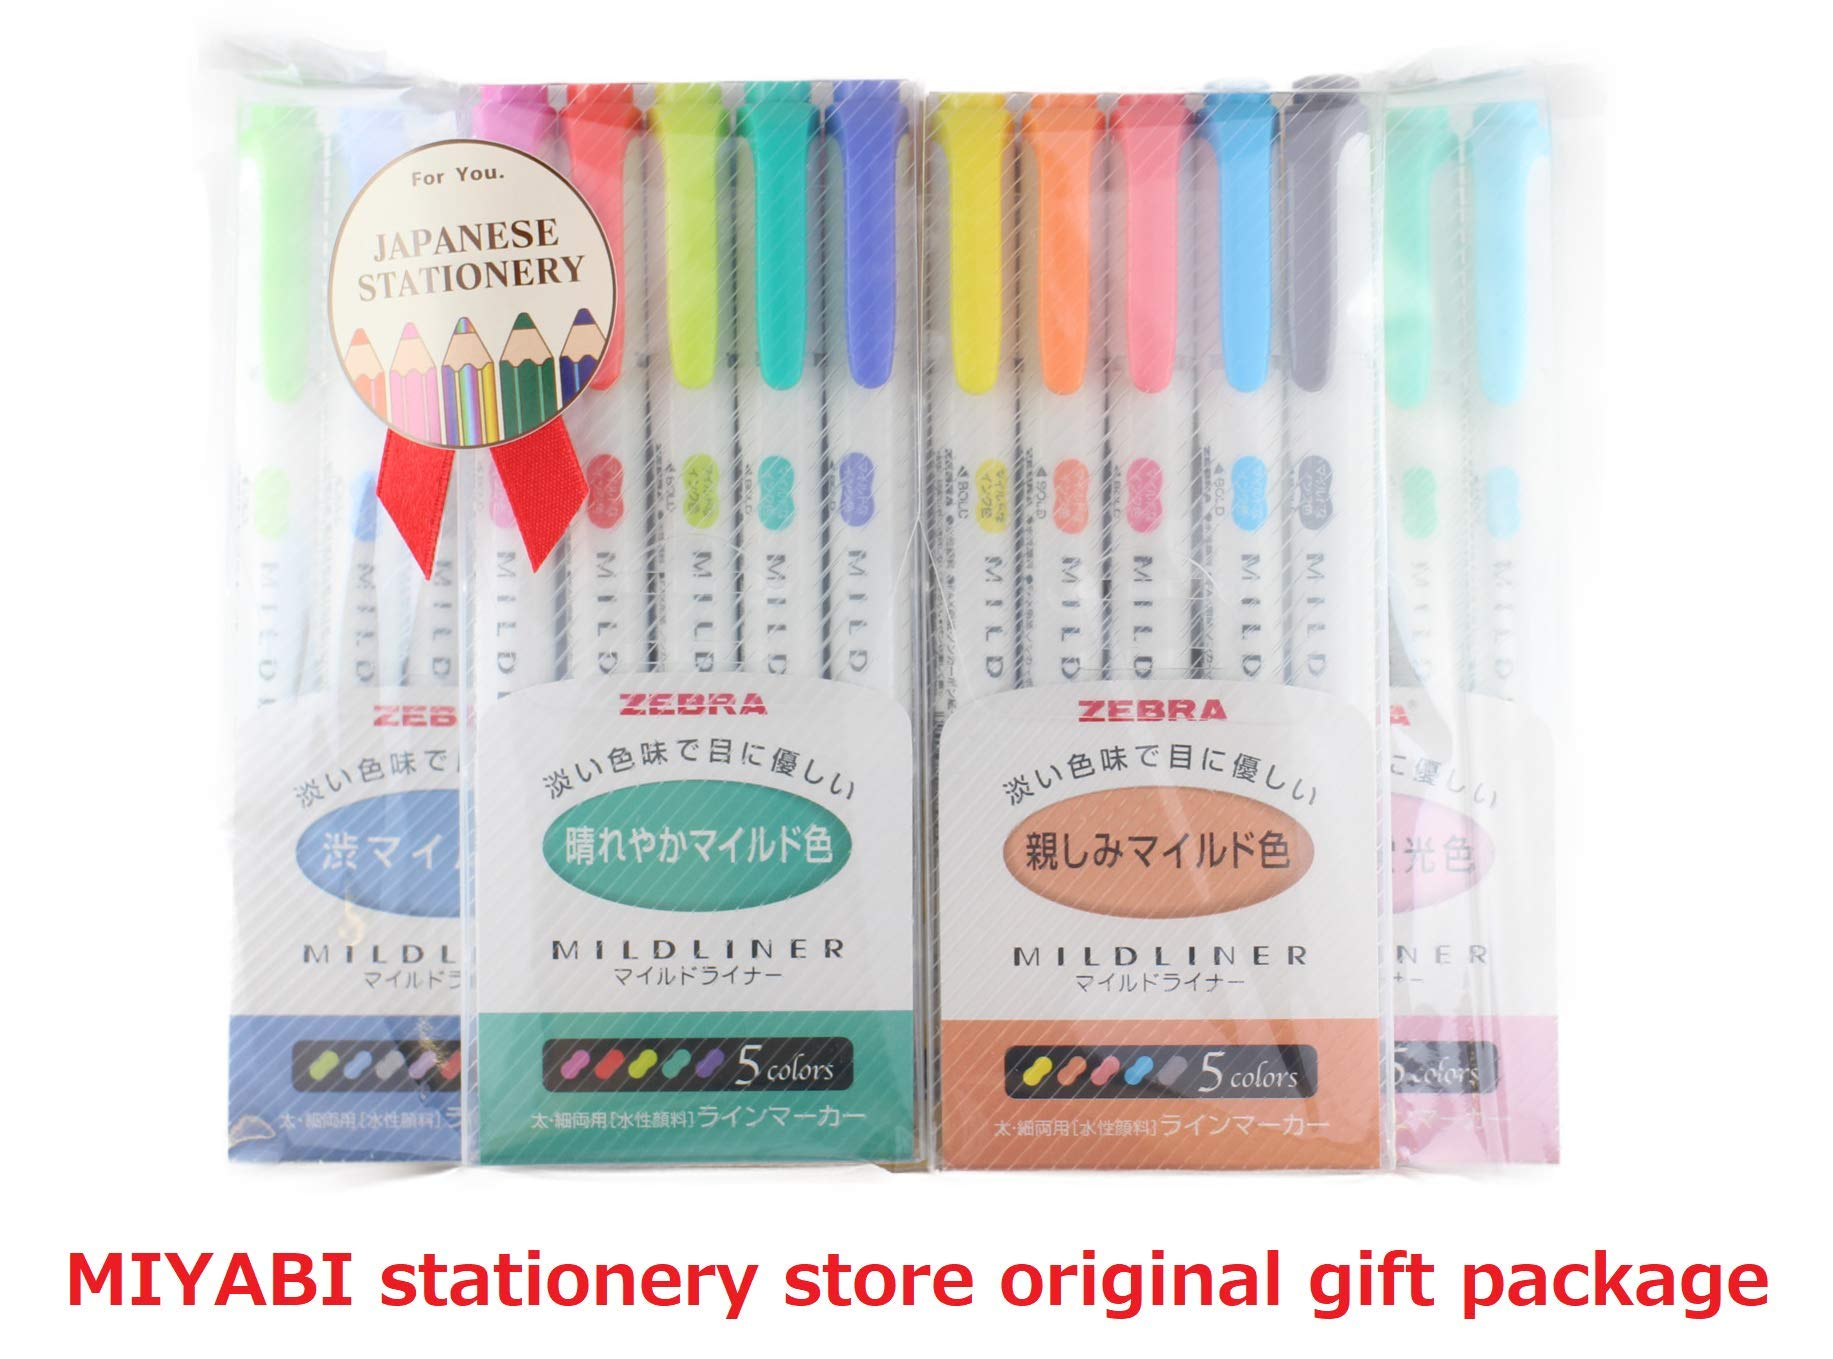 Zebra MILDLINER 5 pack(25 Color) with Japanese Stationery Original Package[5C/RC/NC/N5C/HC]